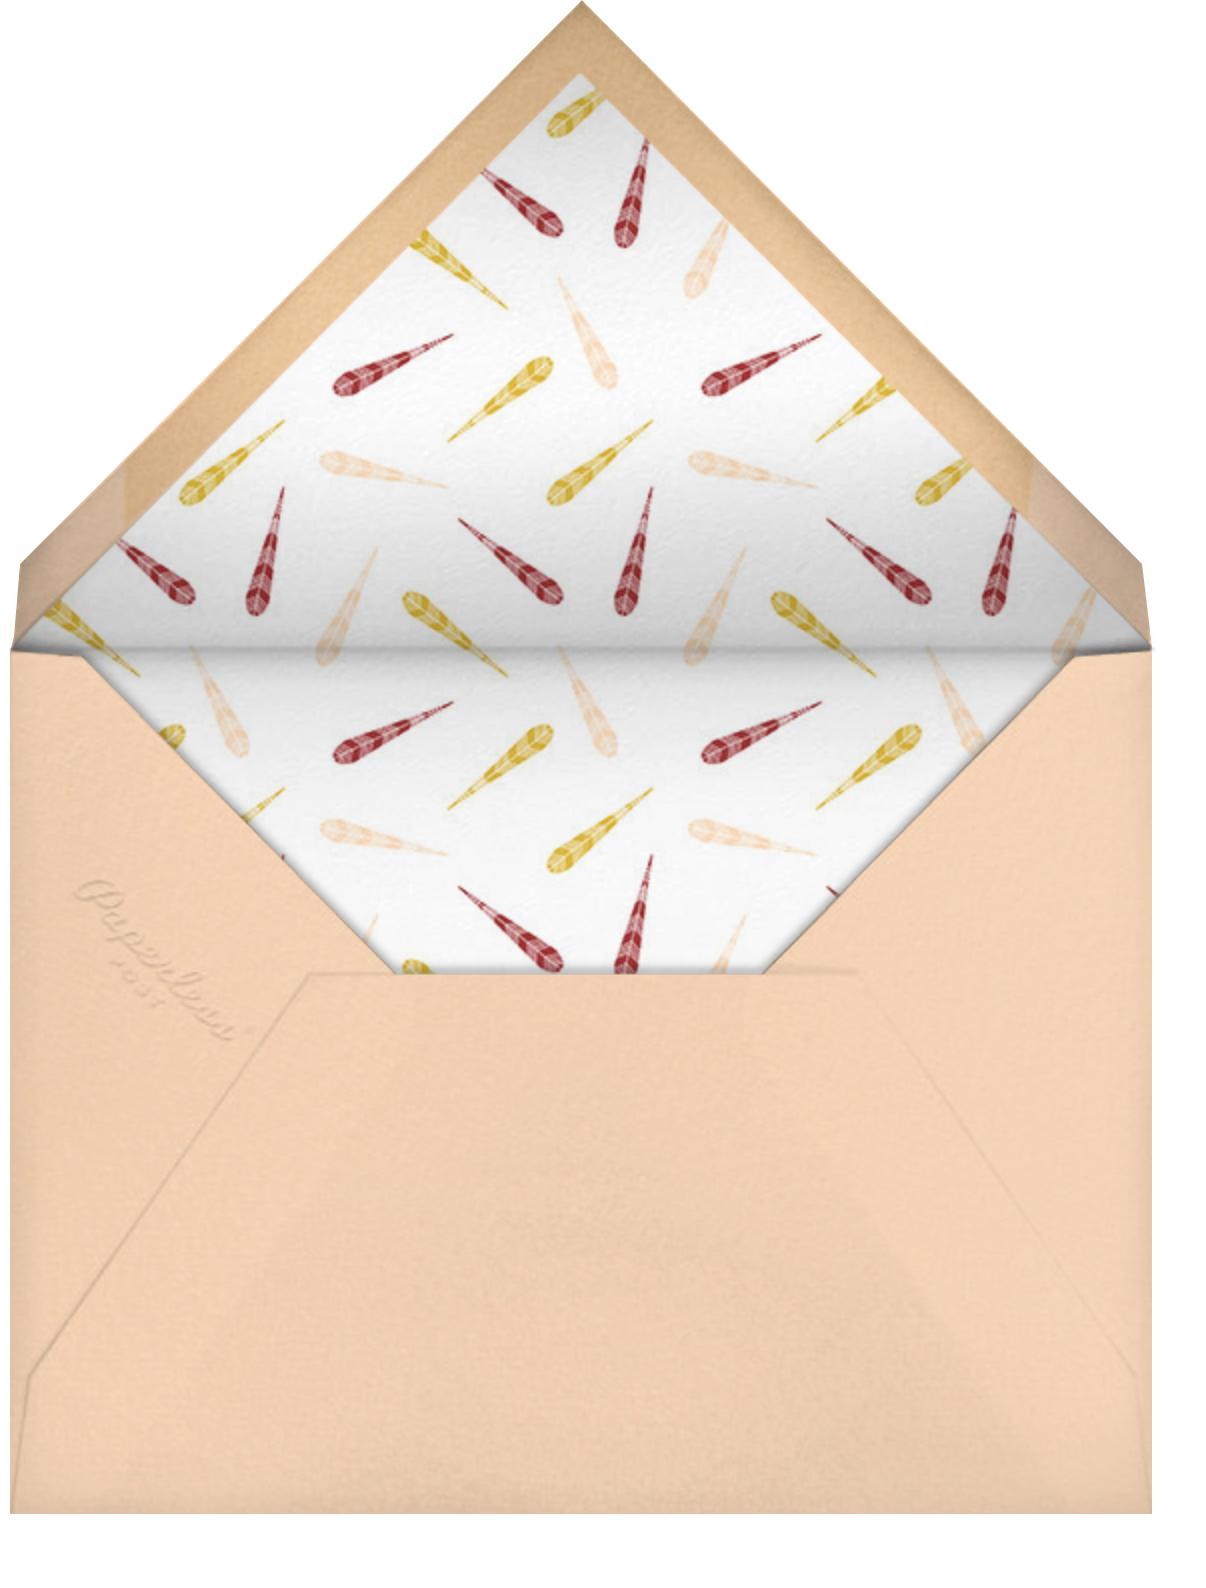 Turkey Feathers - Crate & Barrel - Thanksgiving - envelope back